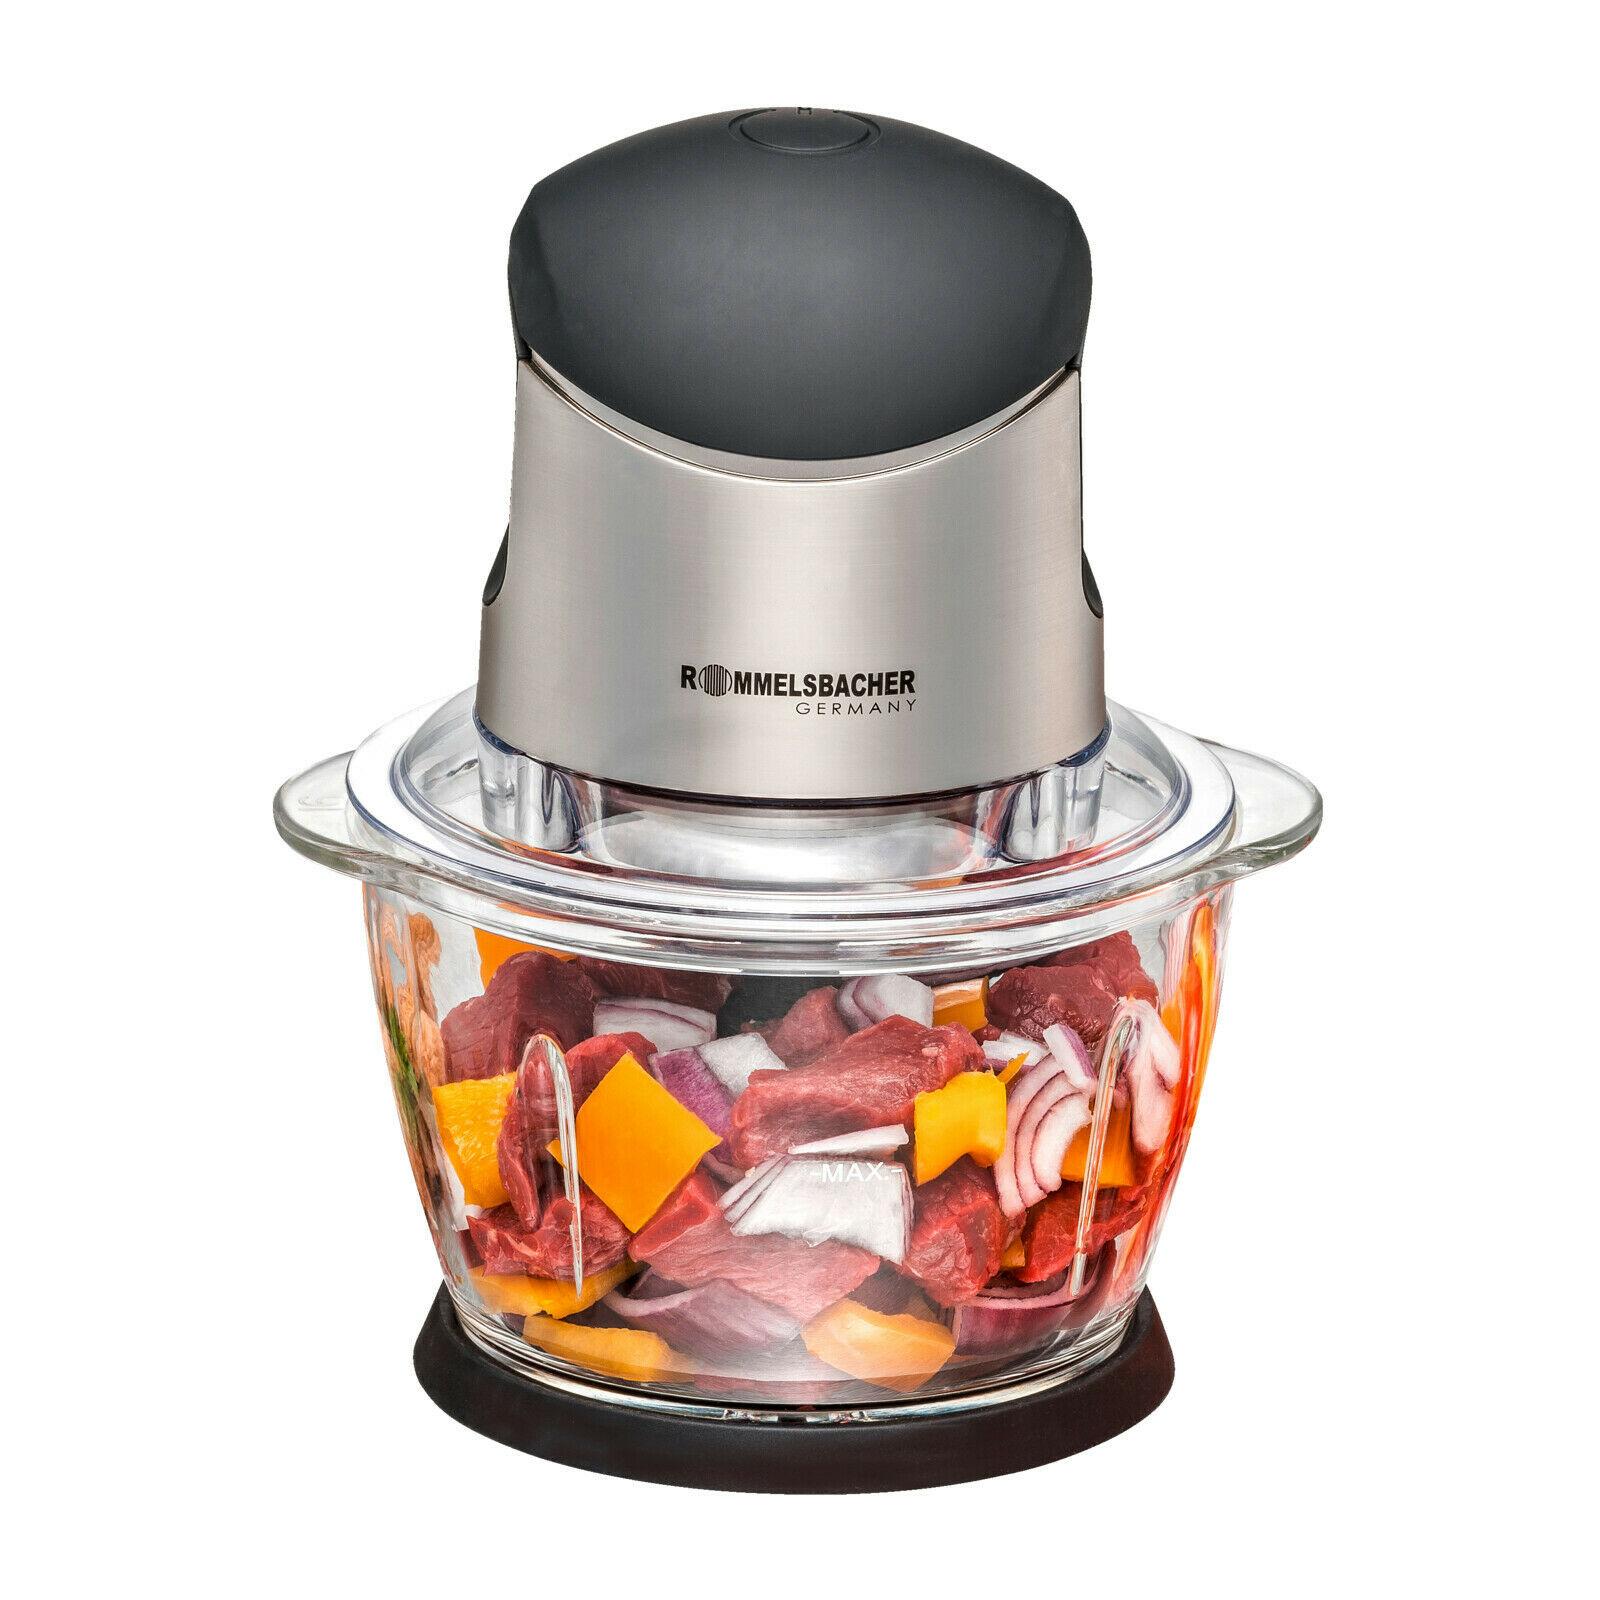 [PRIME/SATURN] Rommelsbacher MZ400 Mini Mixer 33,44/39,44€, Mini food processor, Chopper